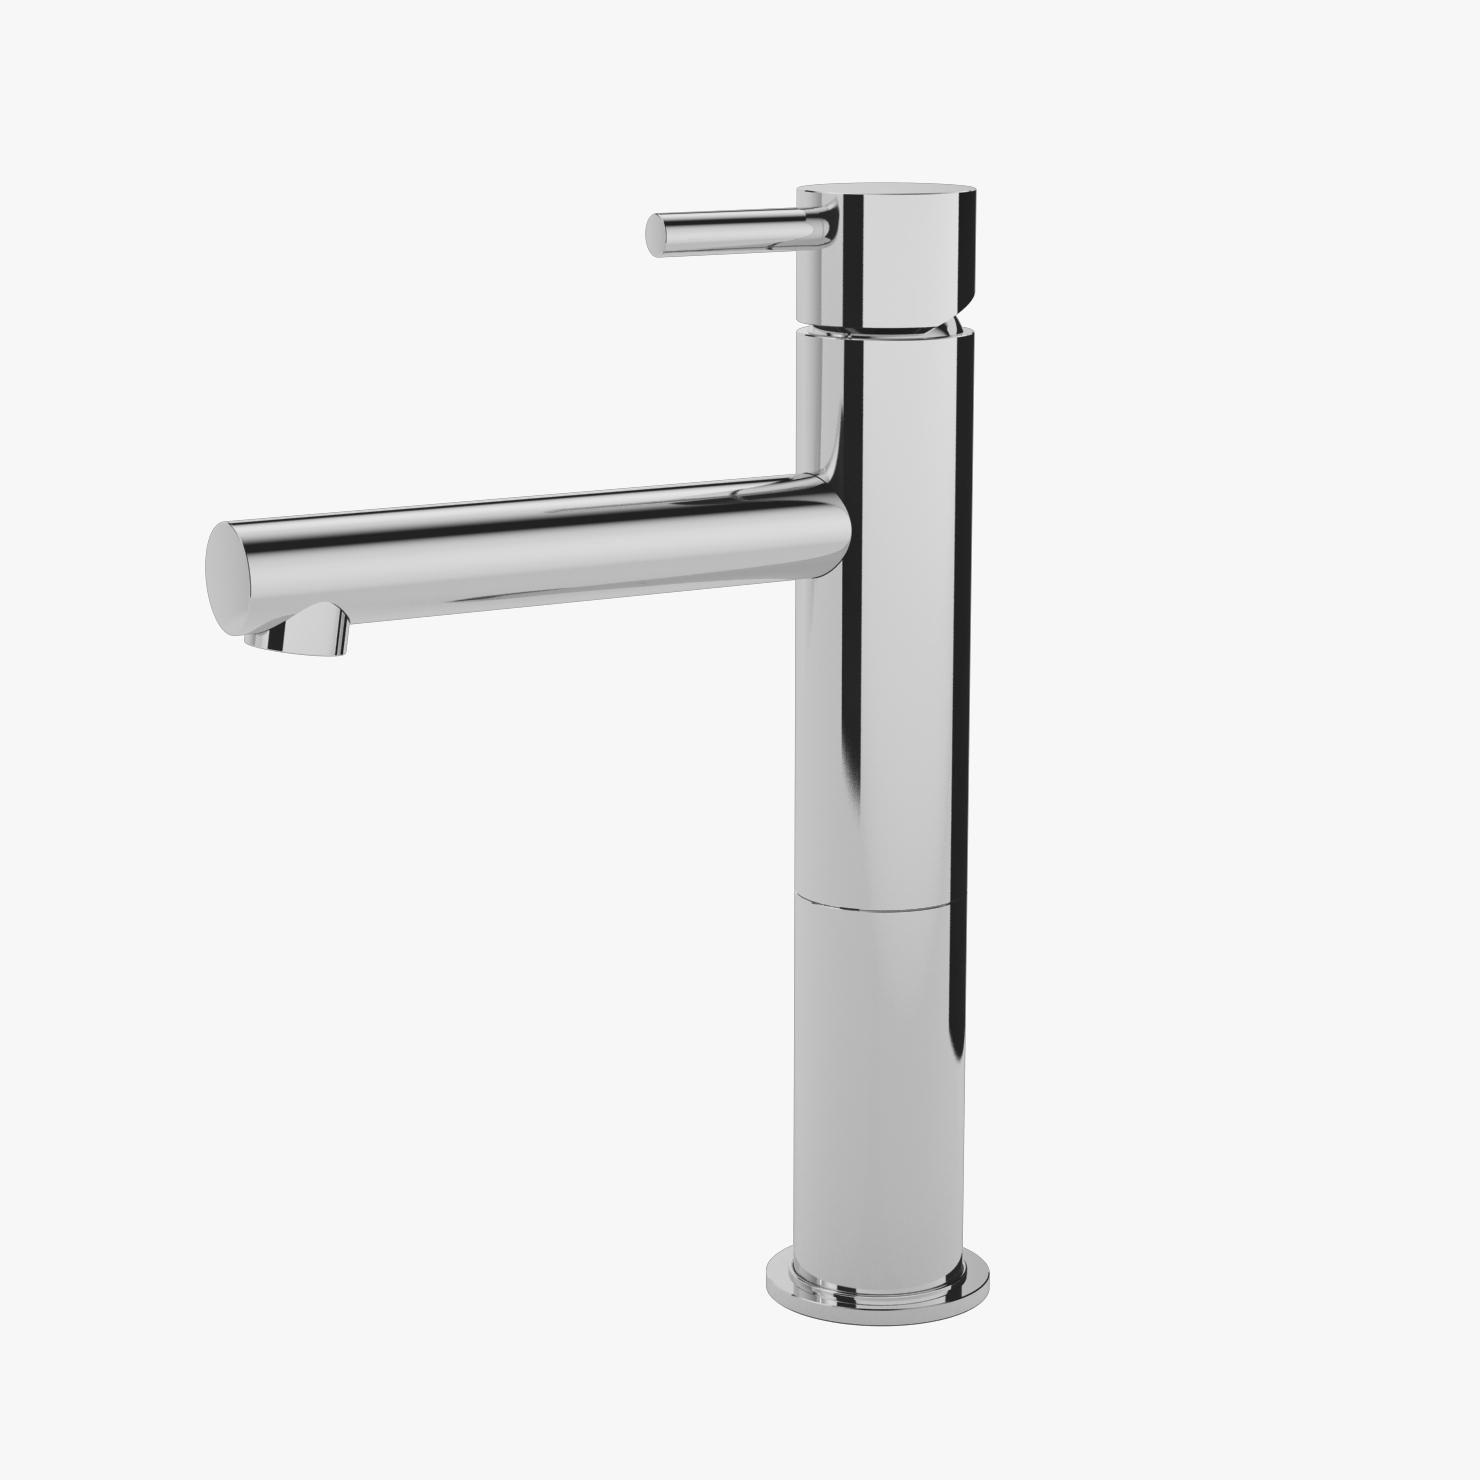 Faucet G11 3d Model Ad Faucet Model Faucet 3d Model Art Inspiration Drawing